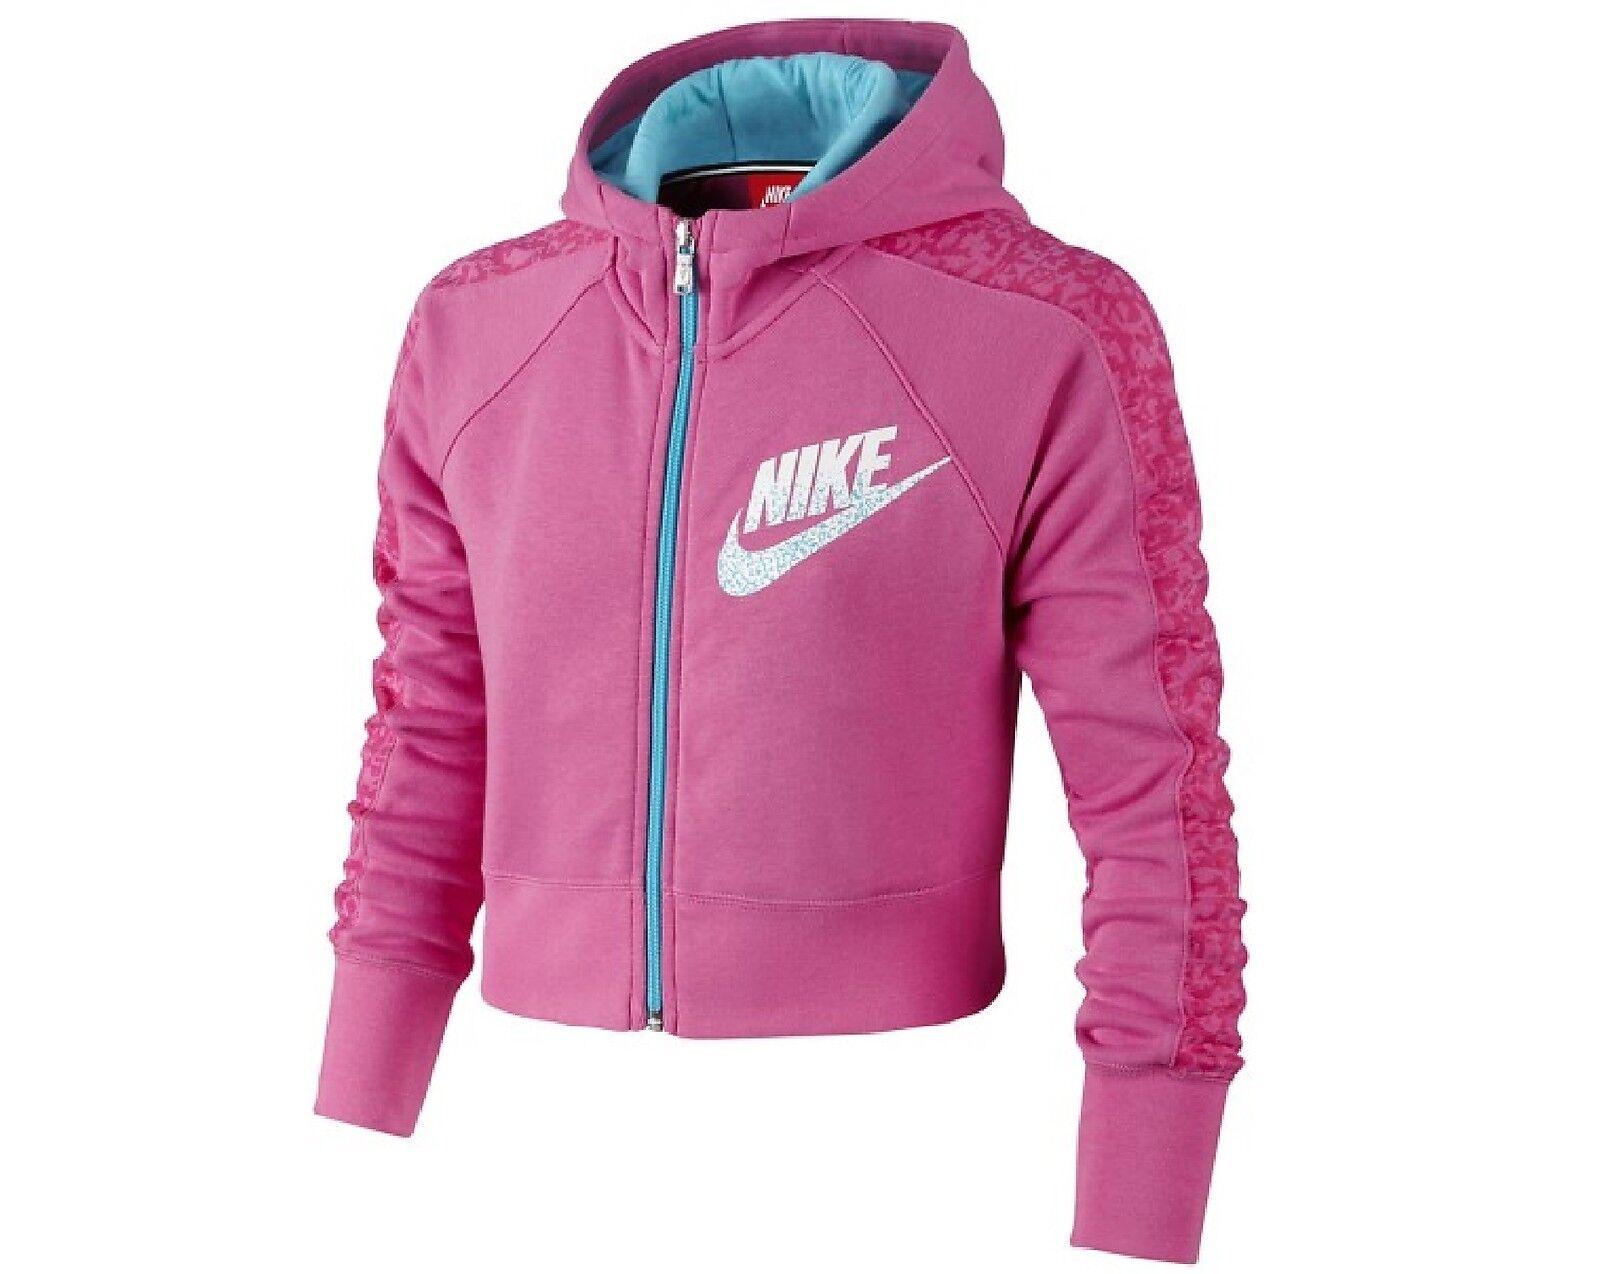 NIKE 645103 - Sweat-Shirt court à capuche zippé - Fille Tennis Sport NEUF